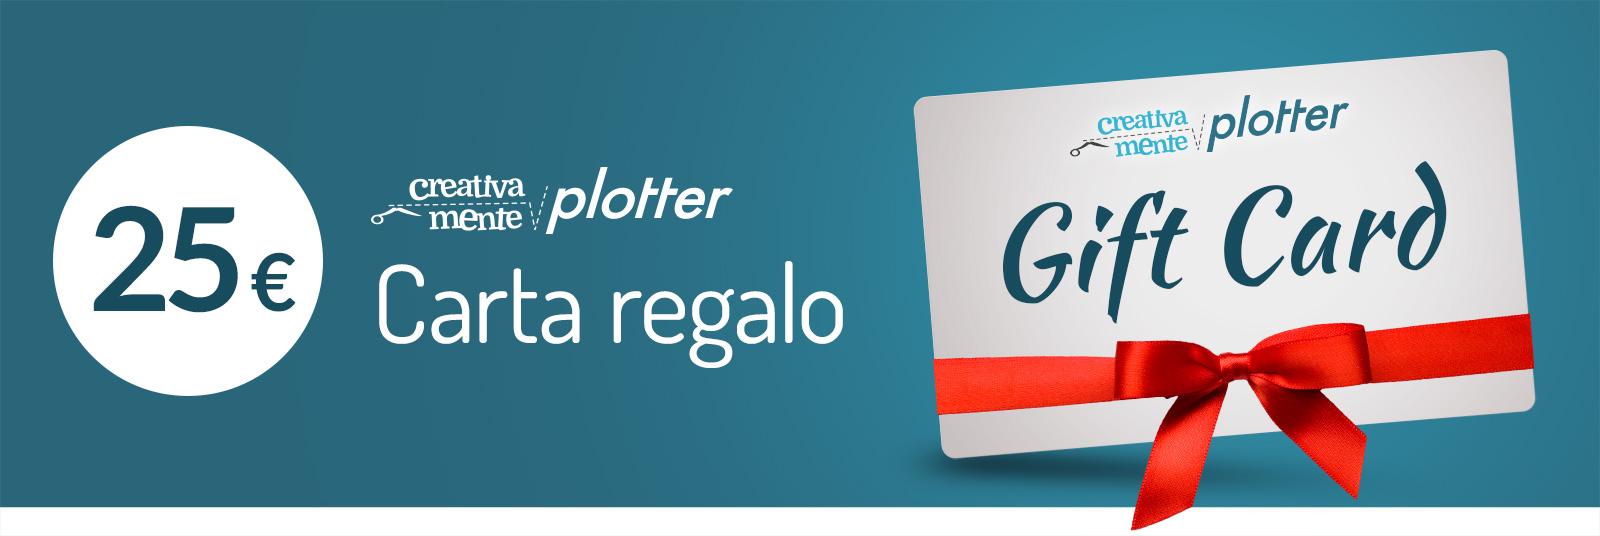 Gift-Card-2021-Creativamente-Plotter-25